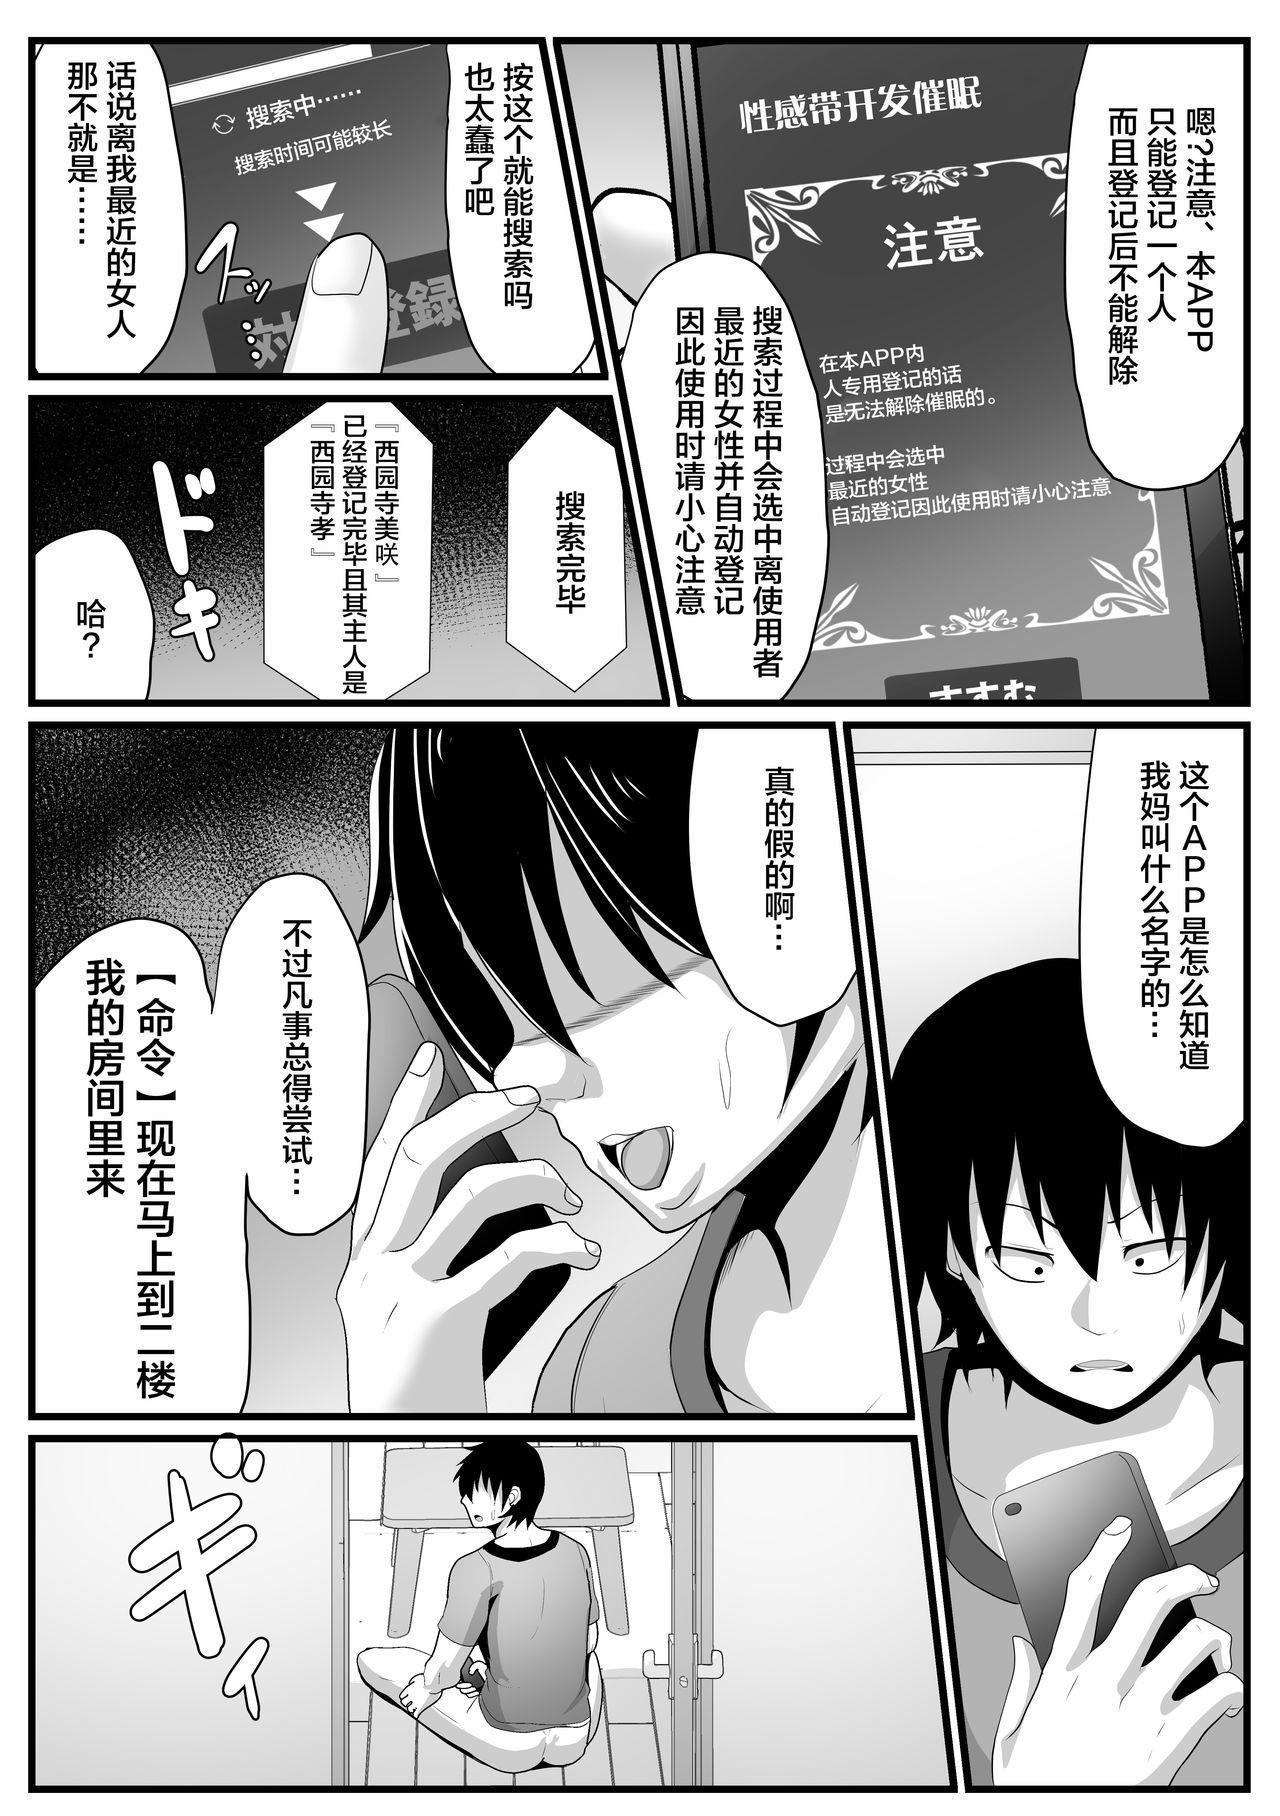 [Akikan] Kaa-san Senyou Saimin Appli[Chinese]【不可视汉化】 6